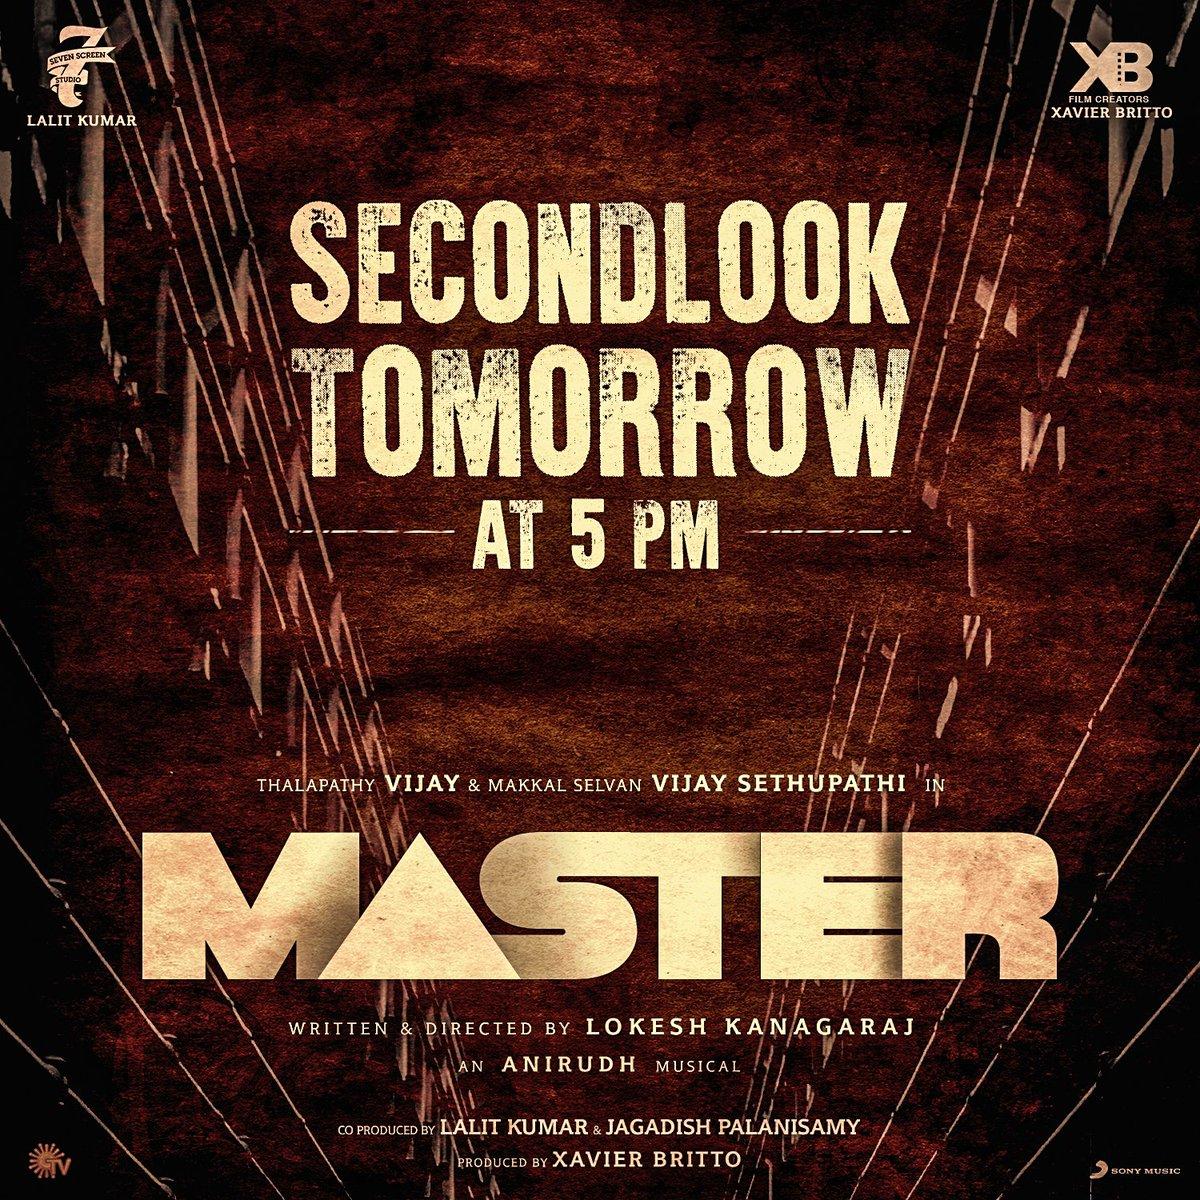 Indha pongal namaku semma treat ma! 😎🔥 Revealing the second look poster of #Master tomorrow at 5 pm.  Gear up for #MasterPongal  #MasterHasArrived #MasterUpdate @actorvijay @VijaySethuOffl @Dir_Lokesh @anirudhofficial @jagadishbliss @Lalit_sevenscr @imKBRshanthnu @MalavikaM_